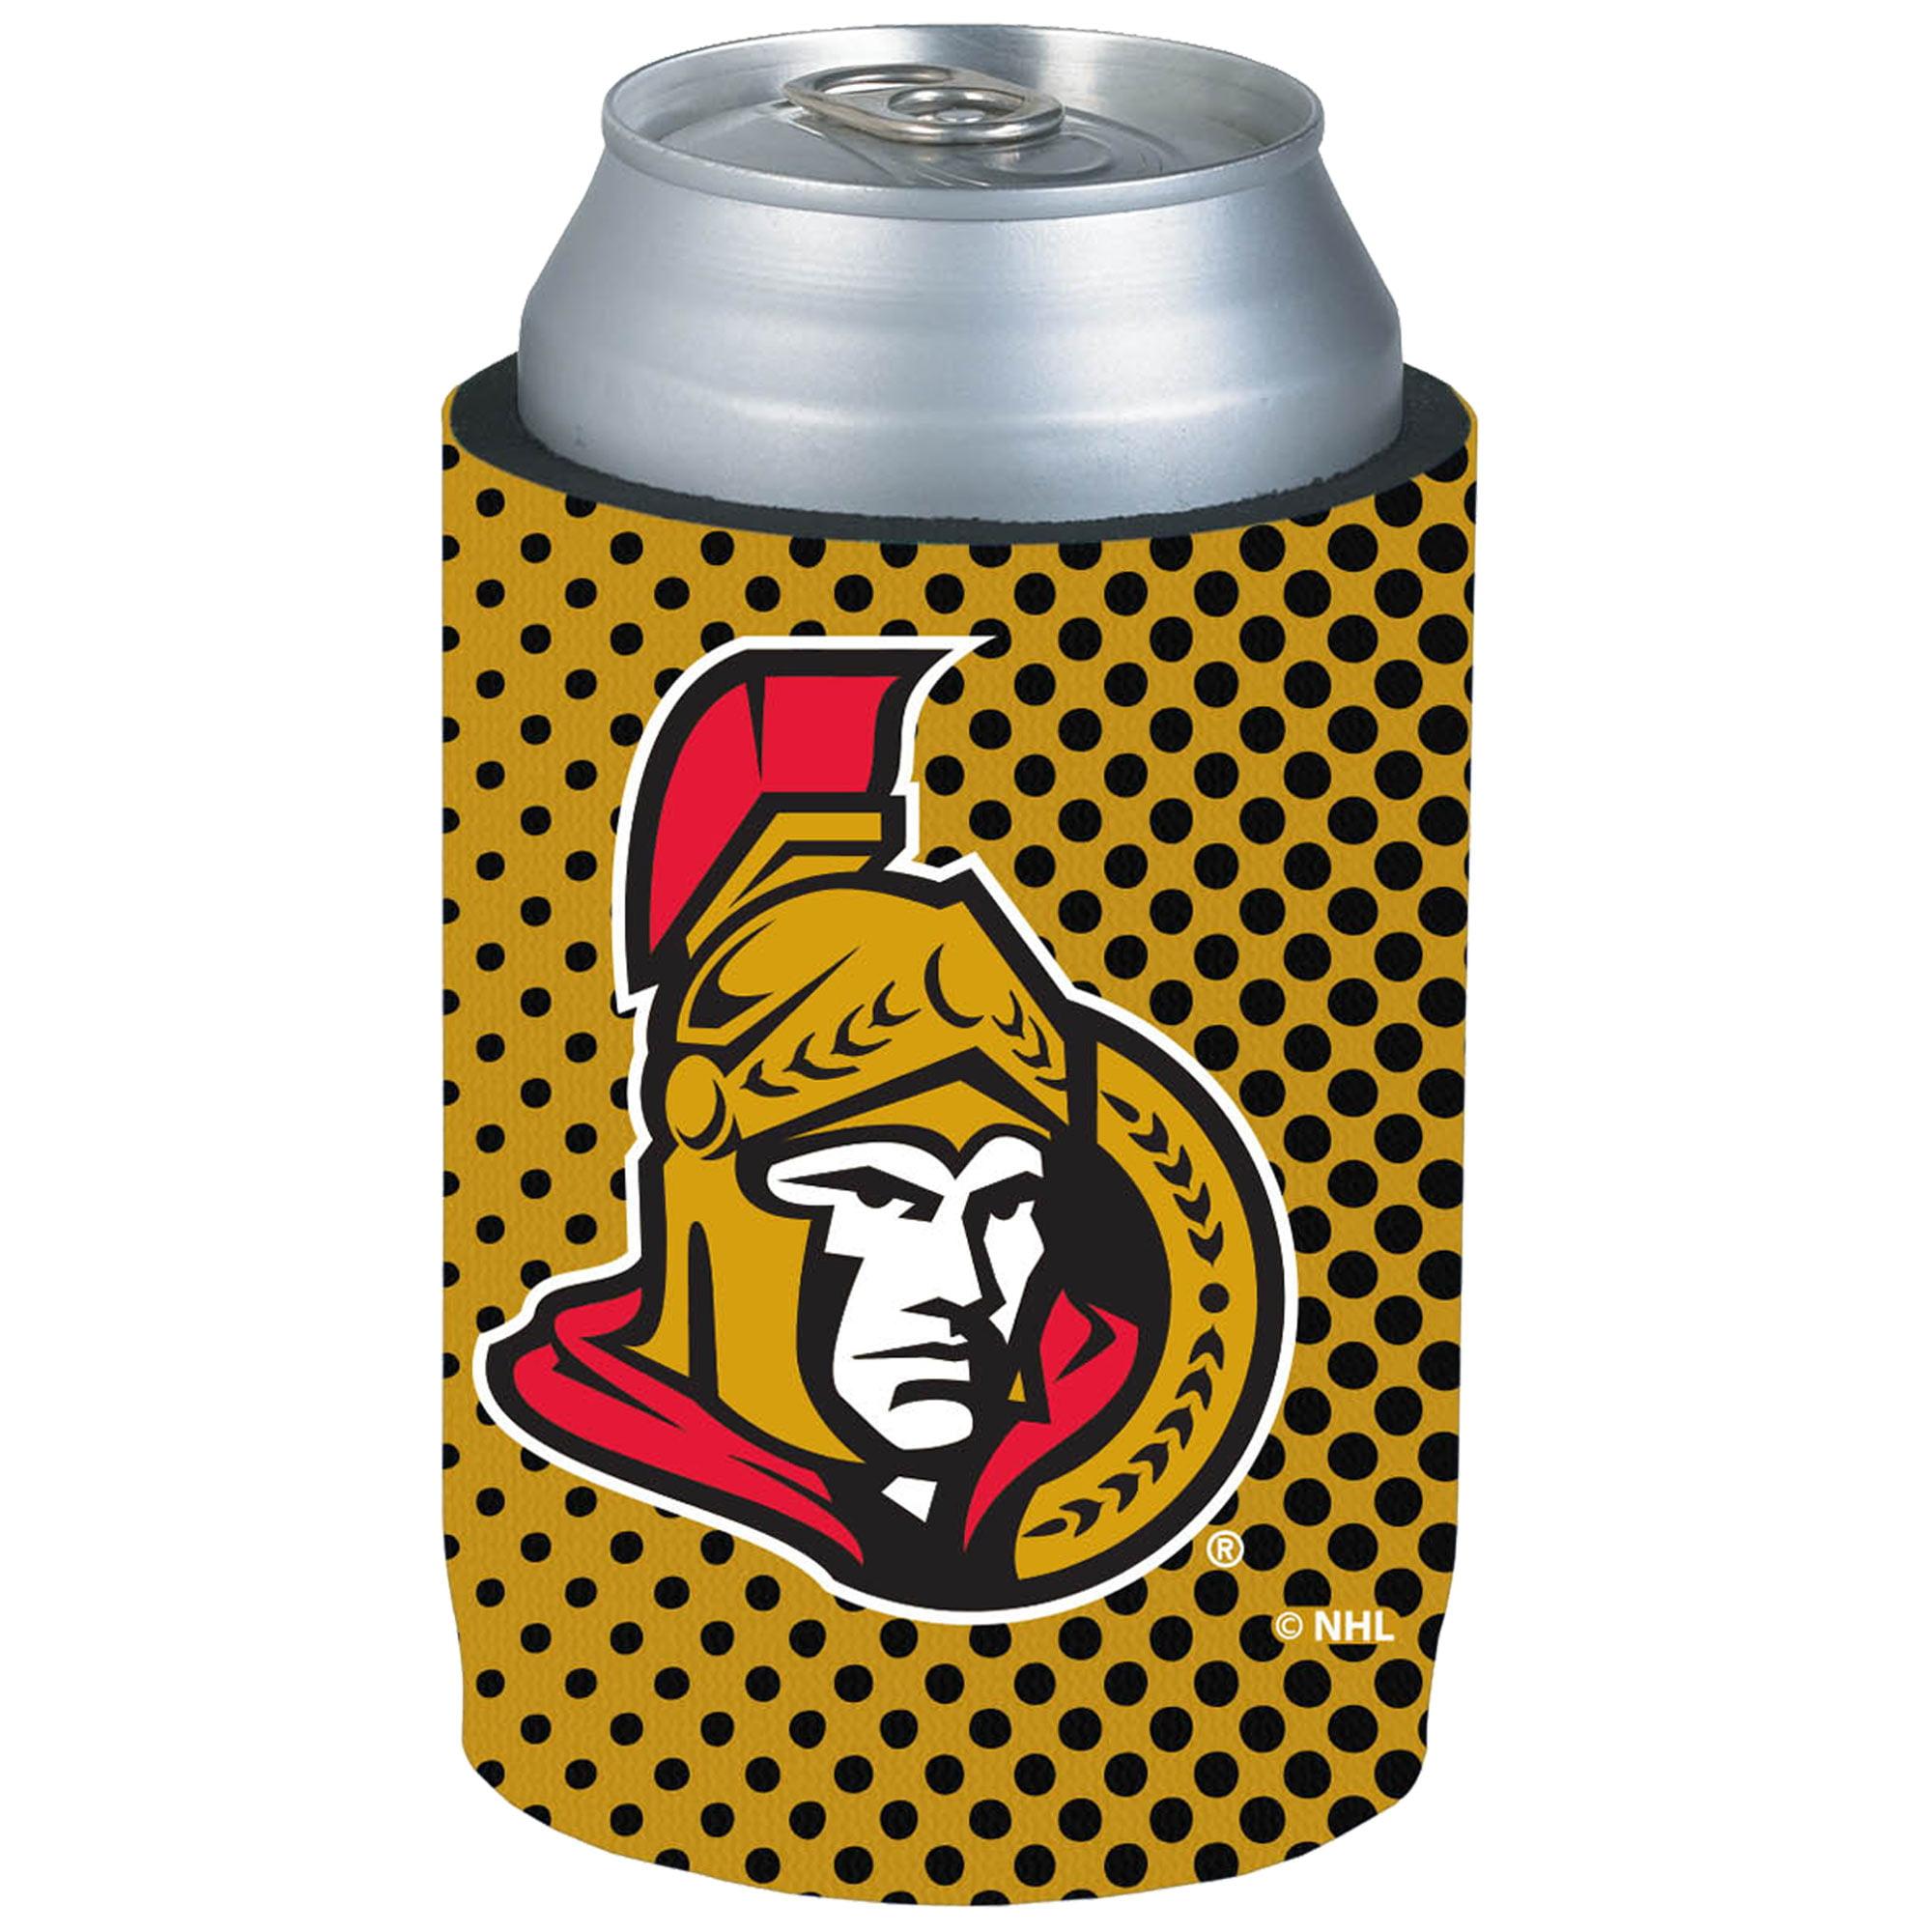 Ottawa Senators Halftone Can Cooler - No Size